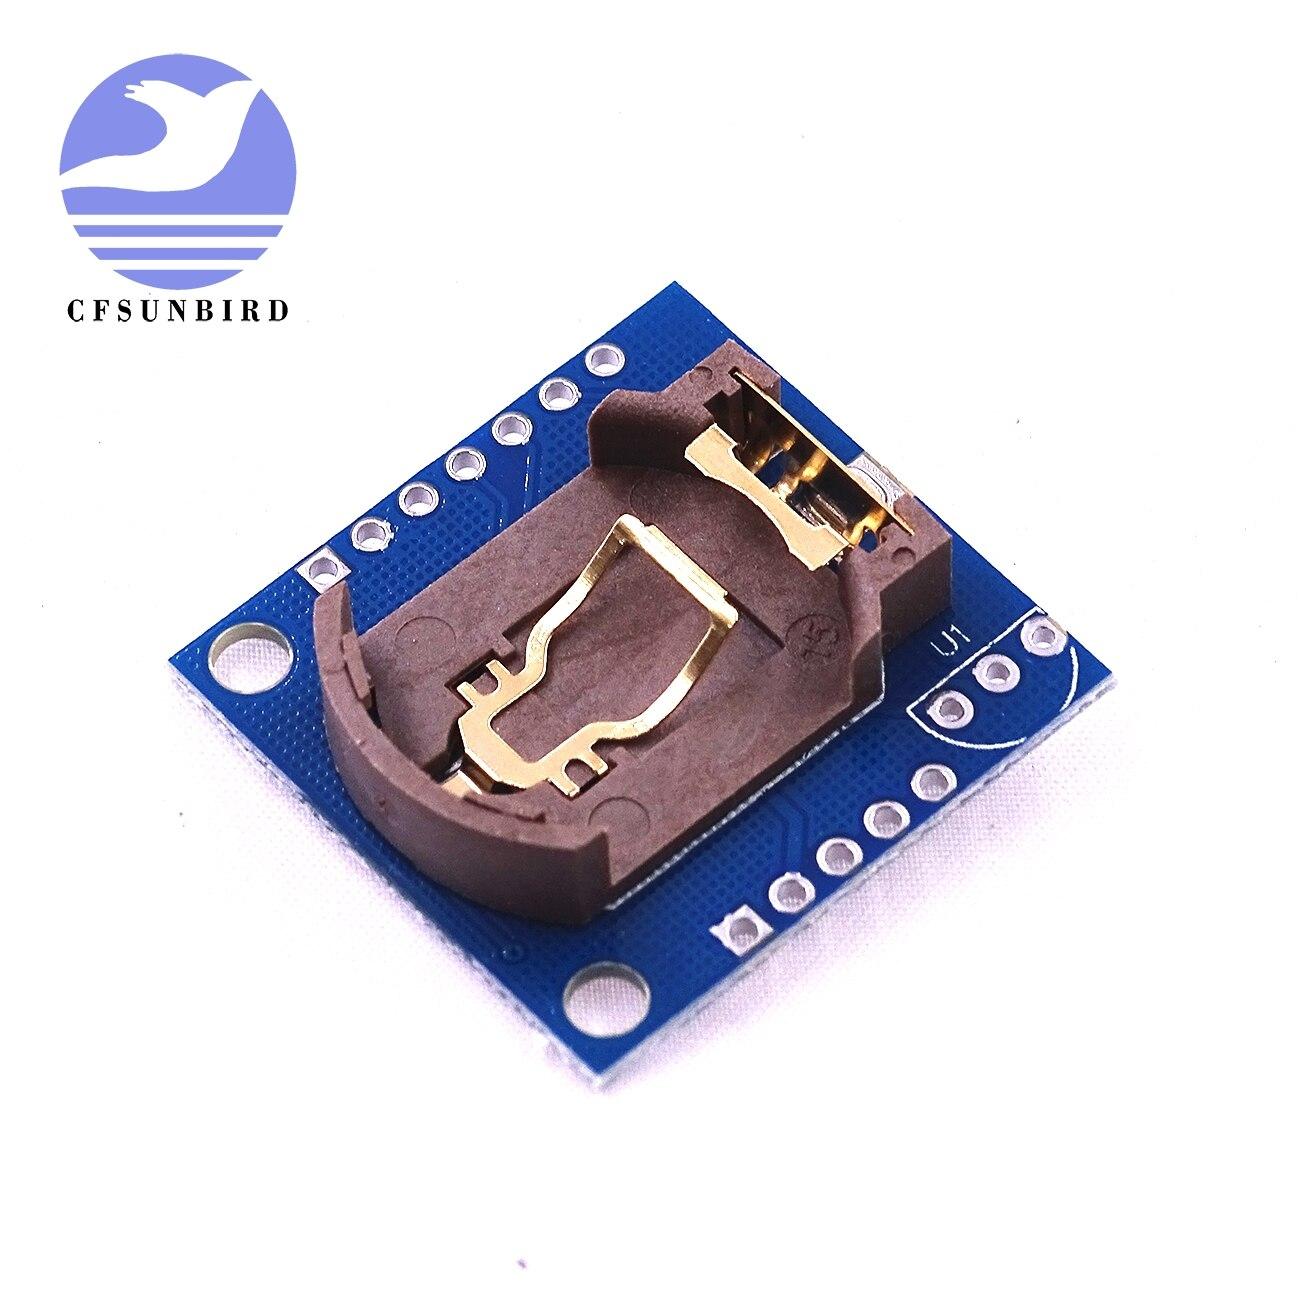 CFsunbird Tiny RTC I2C module 24C32 speicher ds1307 rtc-modul (ohne batterie)